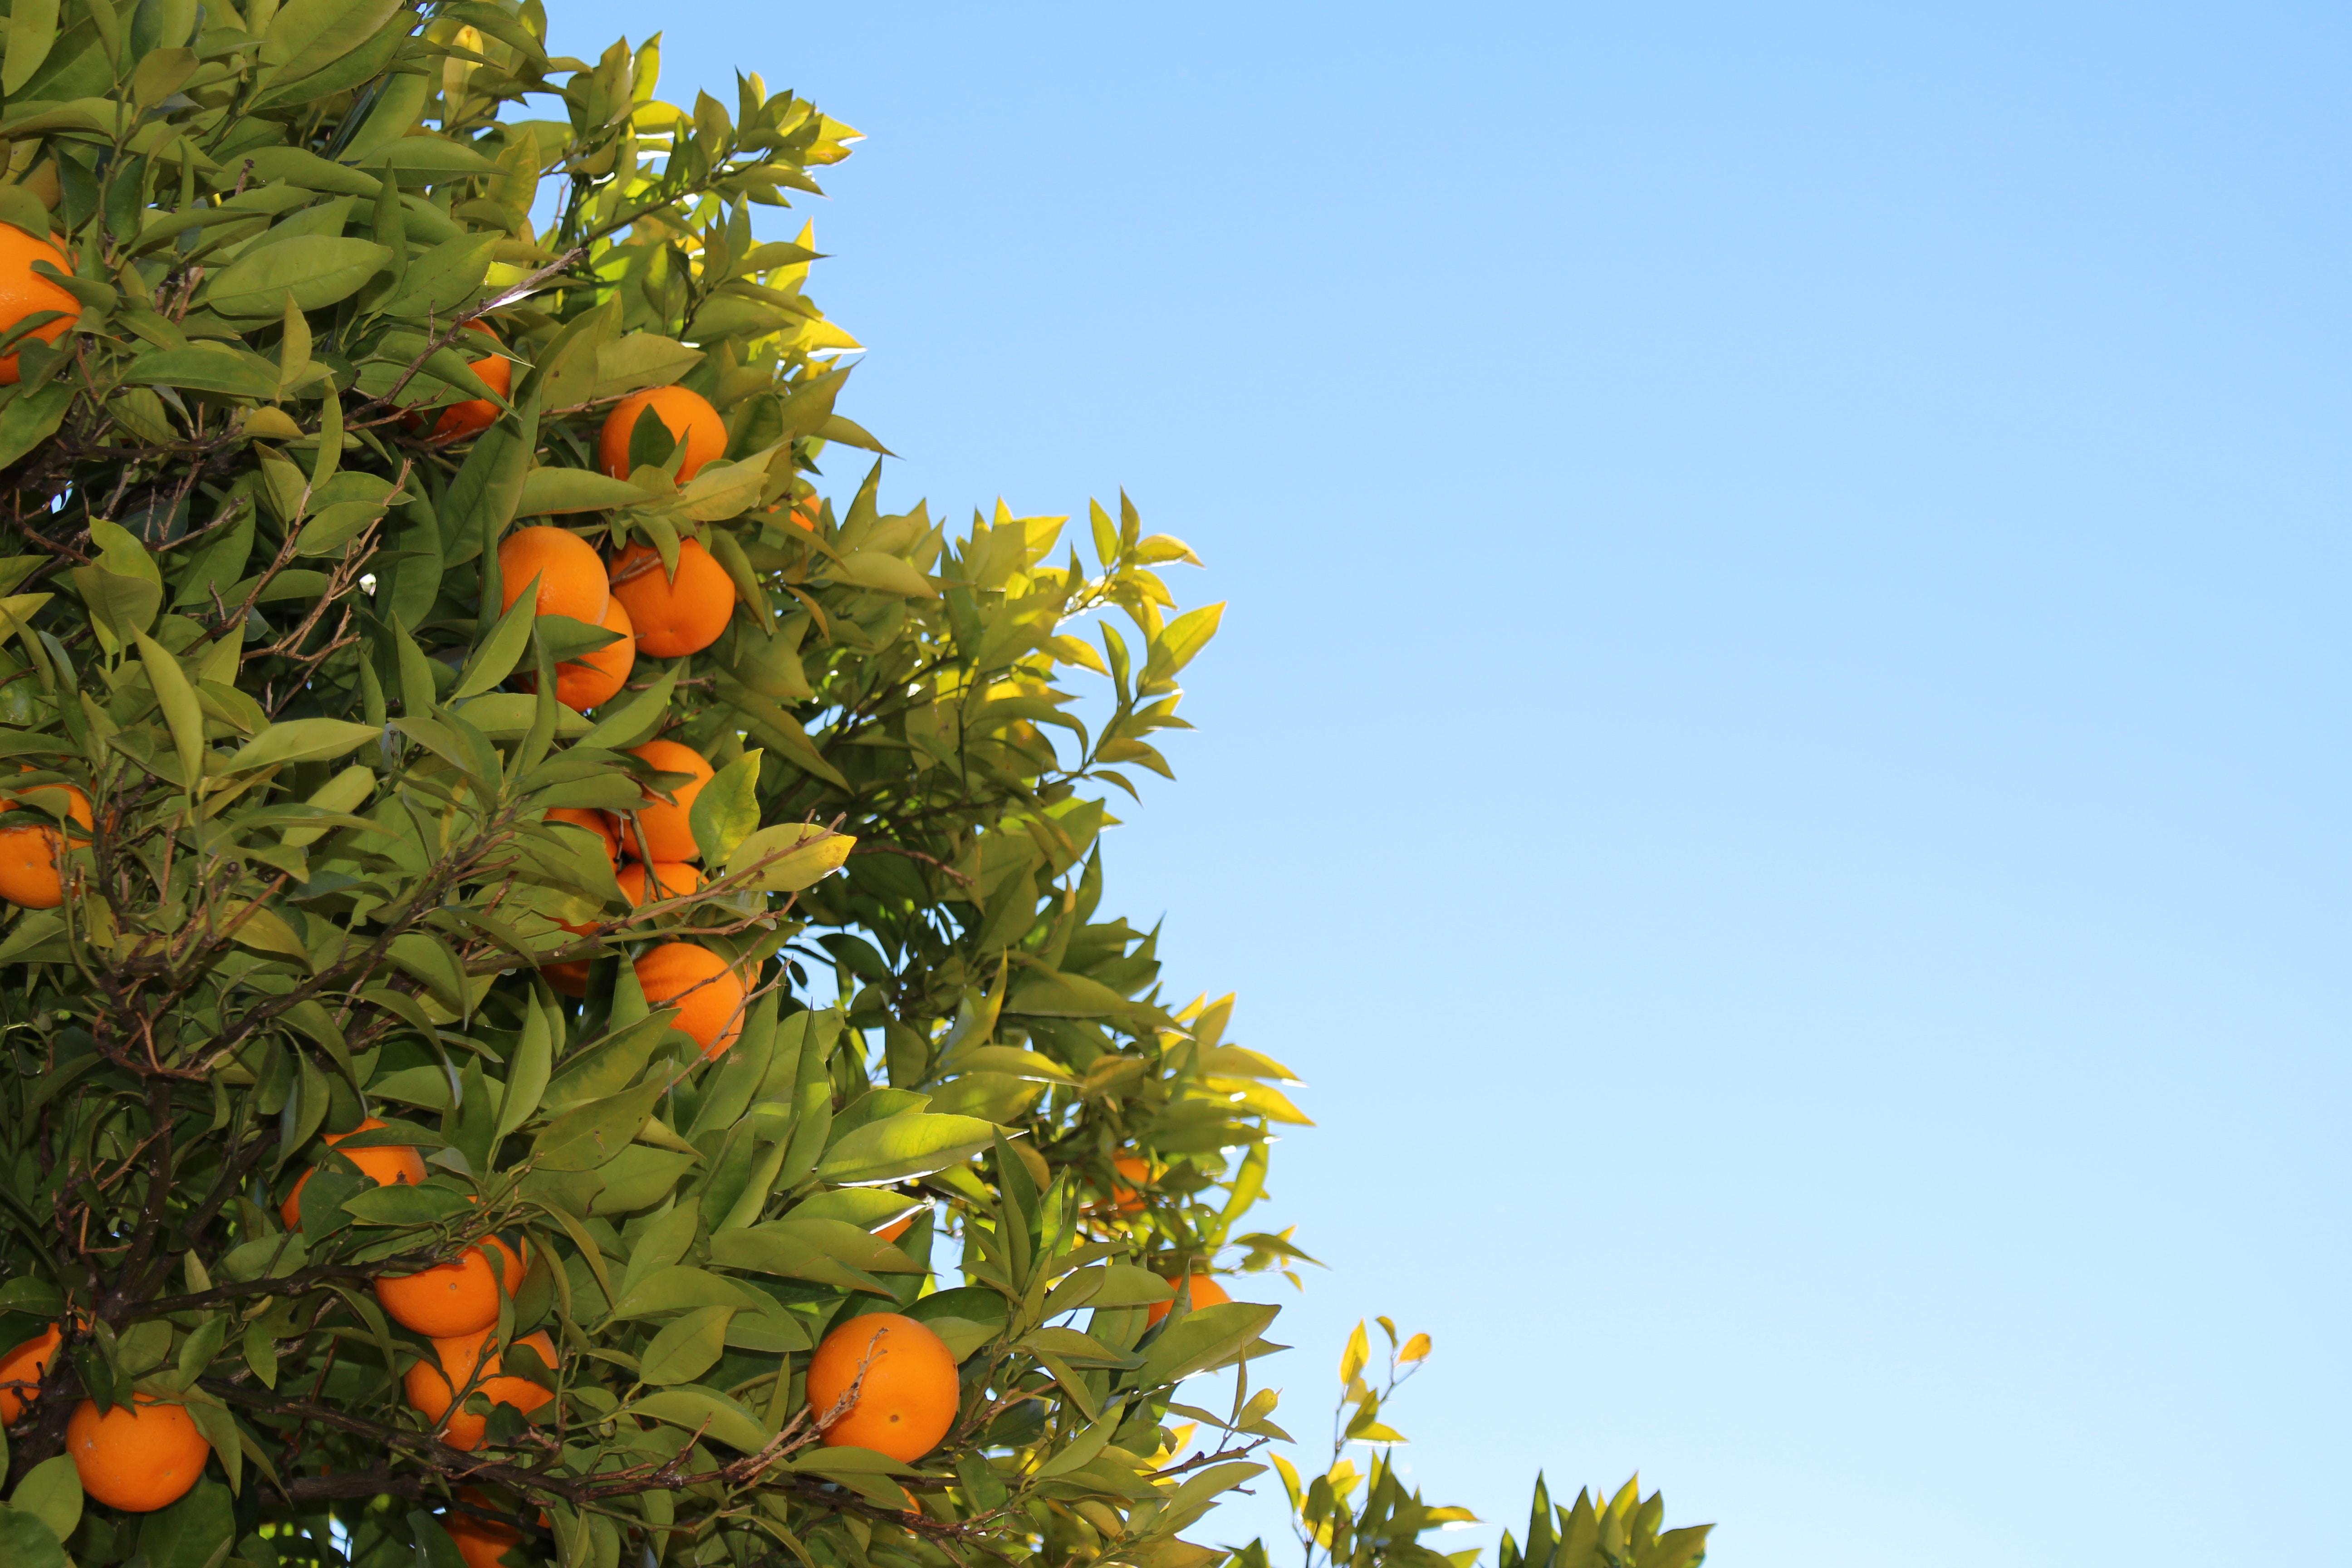 orange fruits in tree